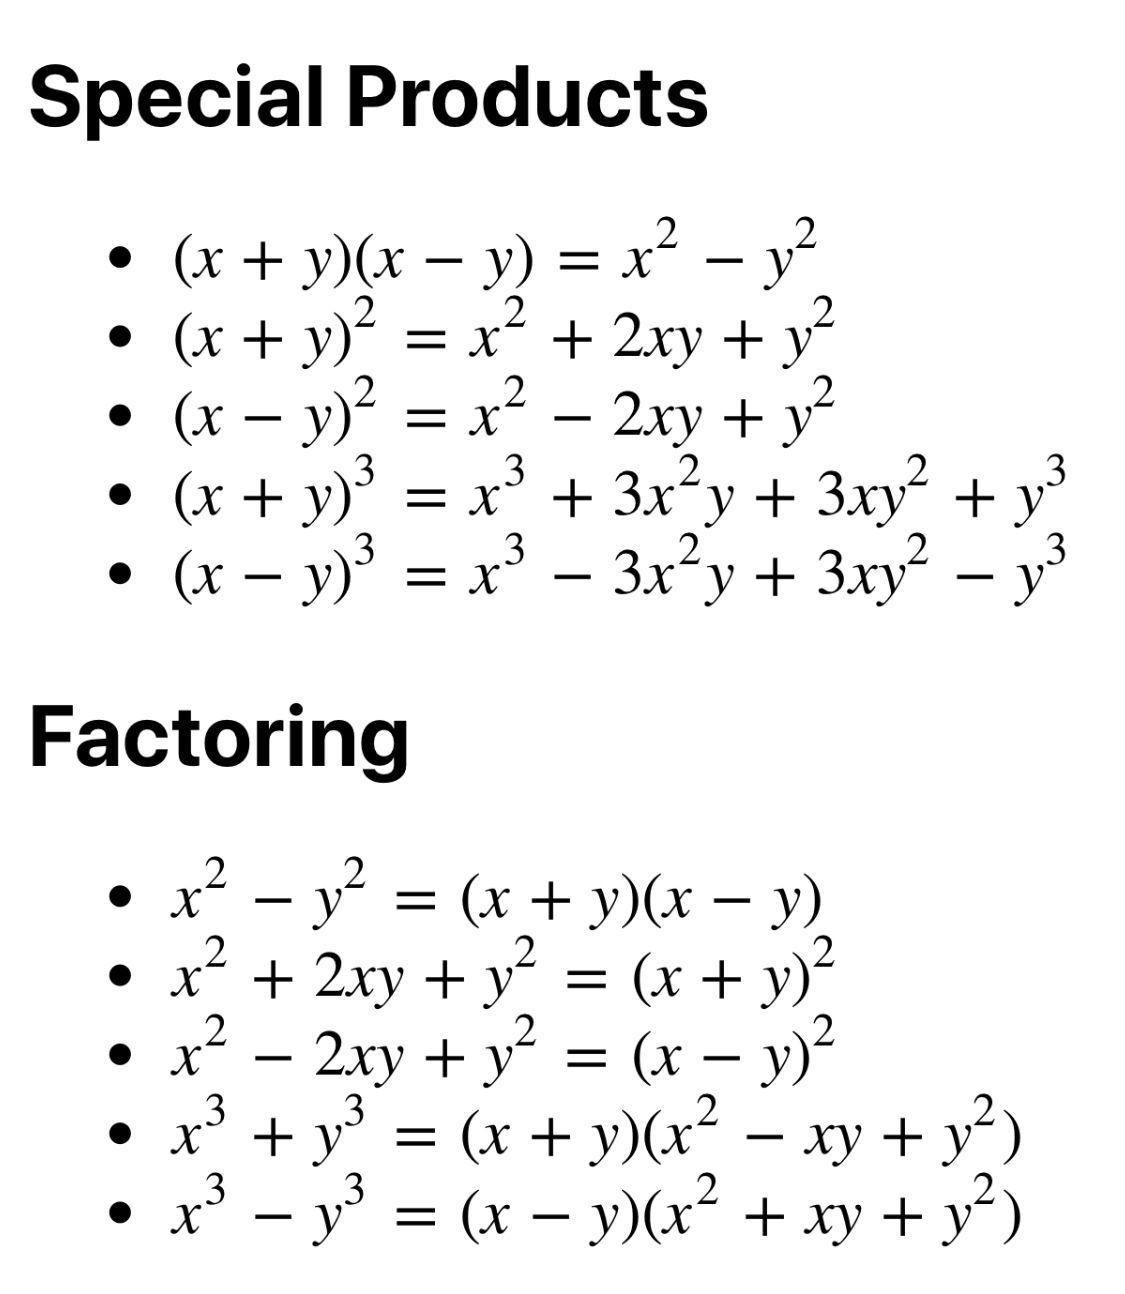 Pin By Dehghanimaryam On Math Magic Gcse Math Learning Mathematics Studying Math Adding and subtracting radical numbers